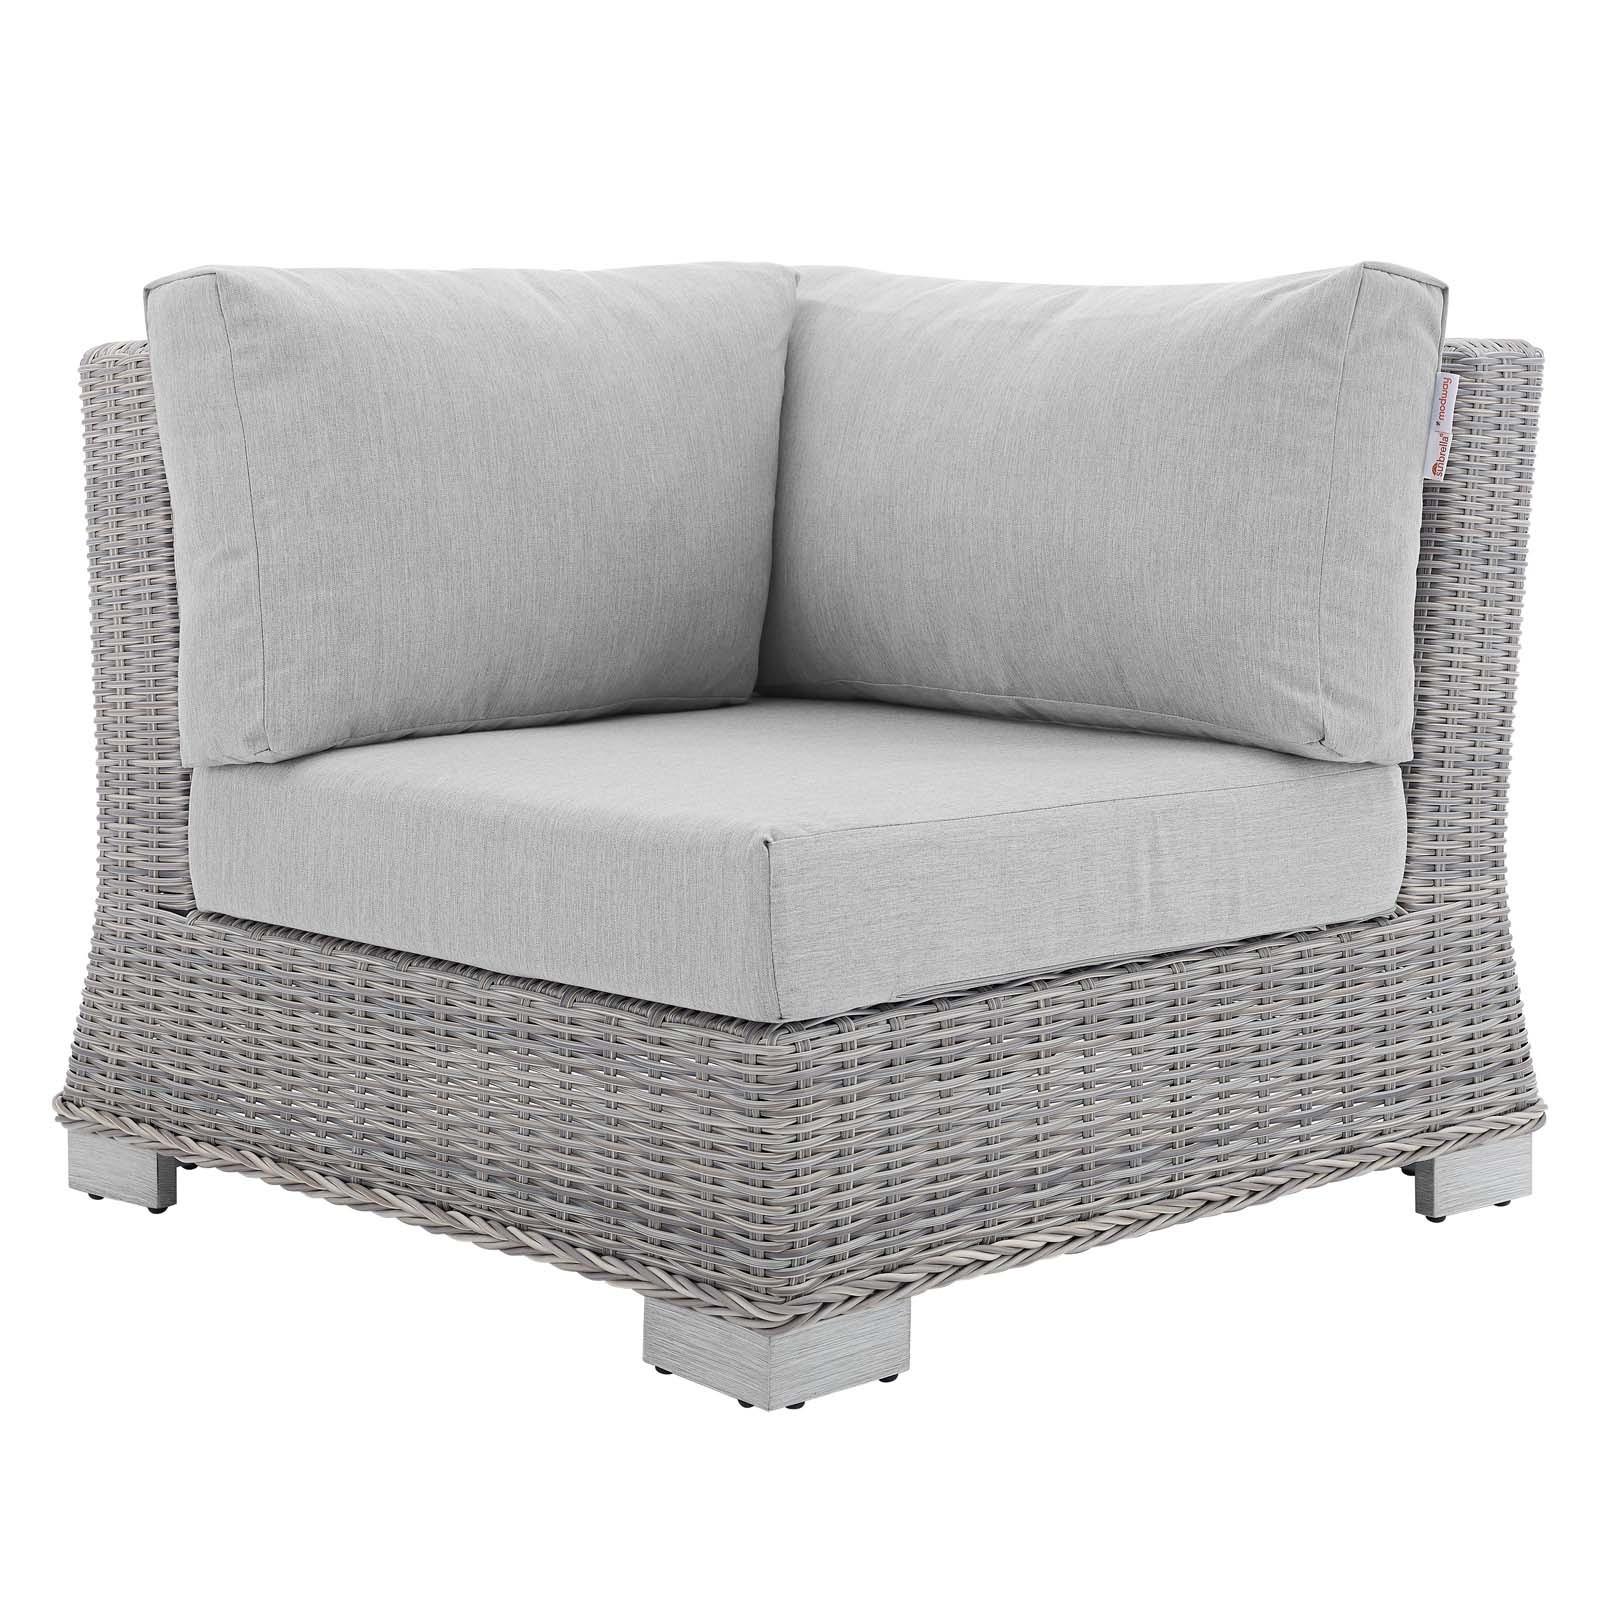 Conway Sunbrella® Outdoor Patio Wicker Rattan Corner Chair